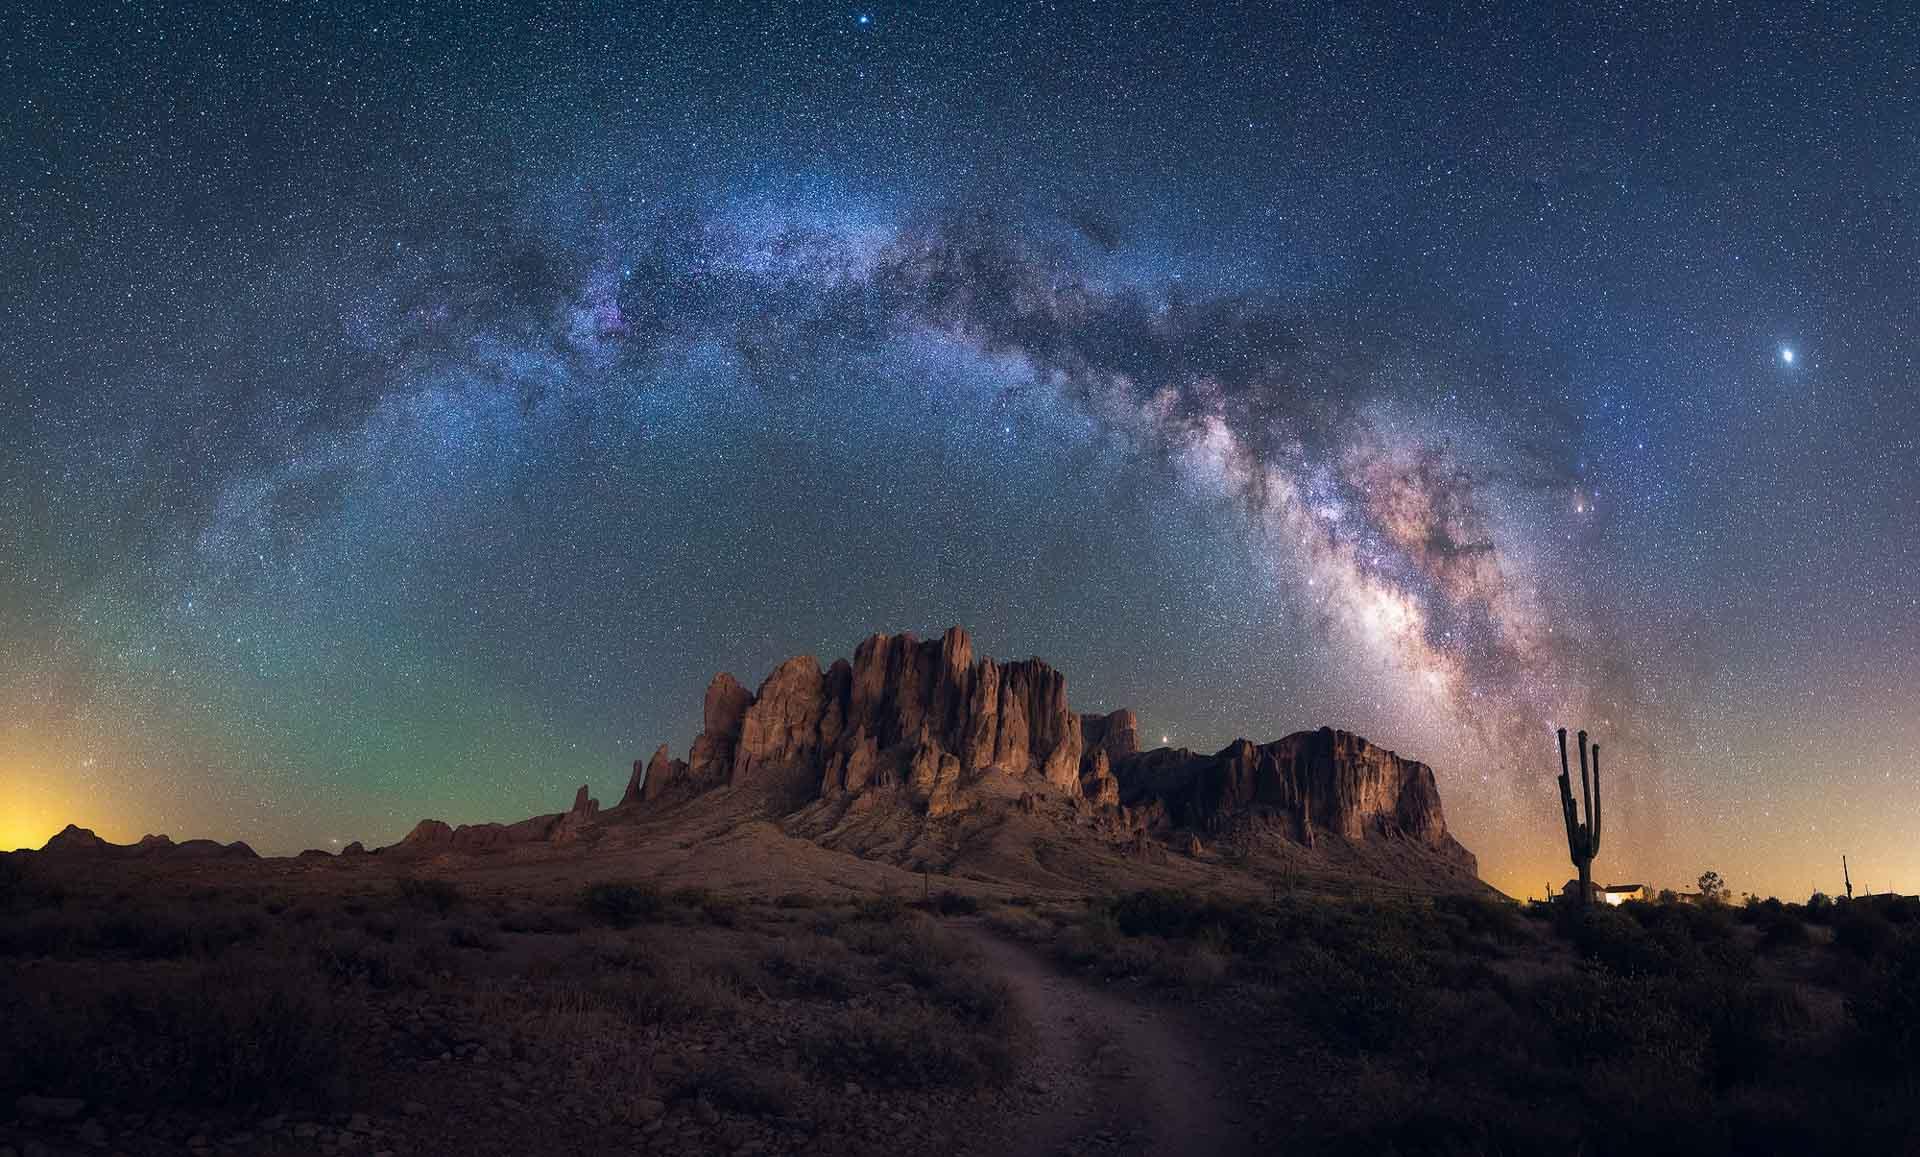 Milky Way Superstition Mountains Arizona USA